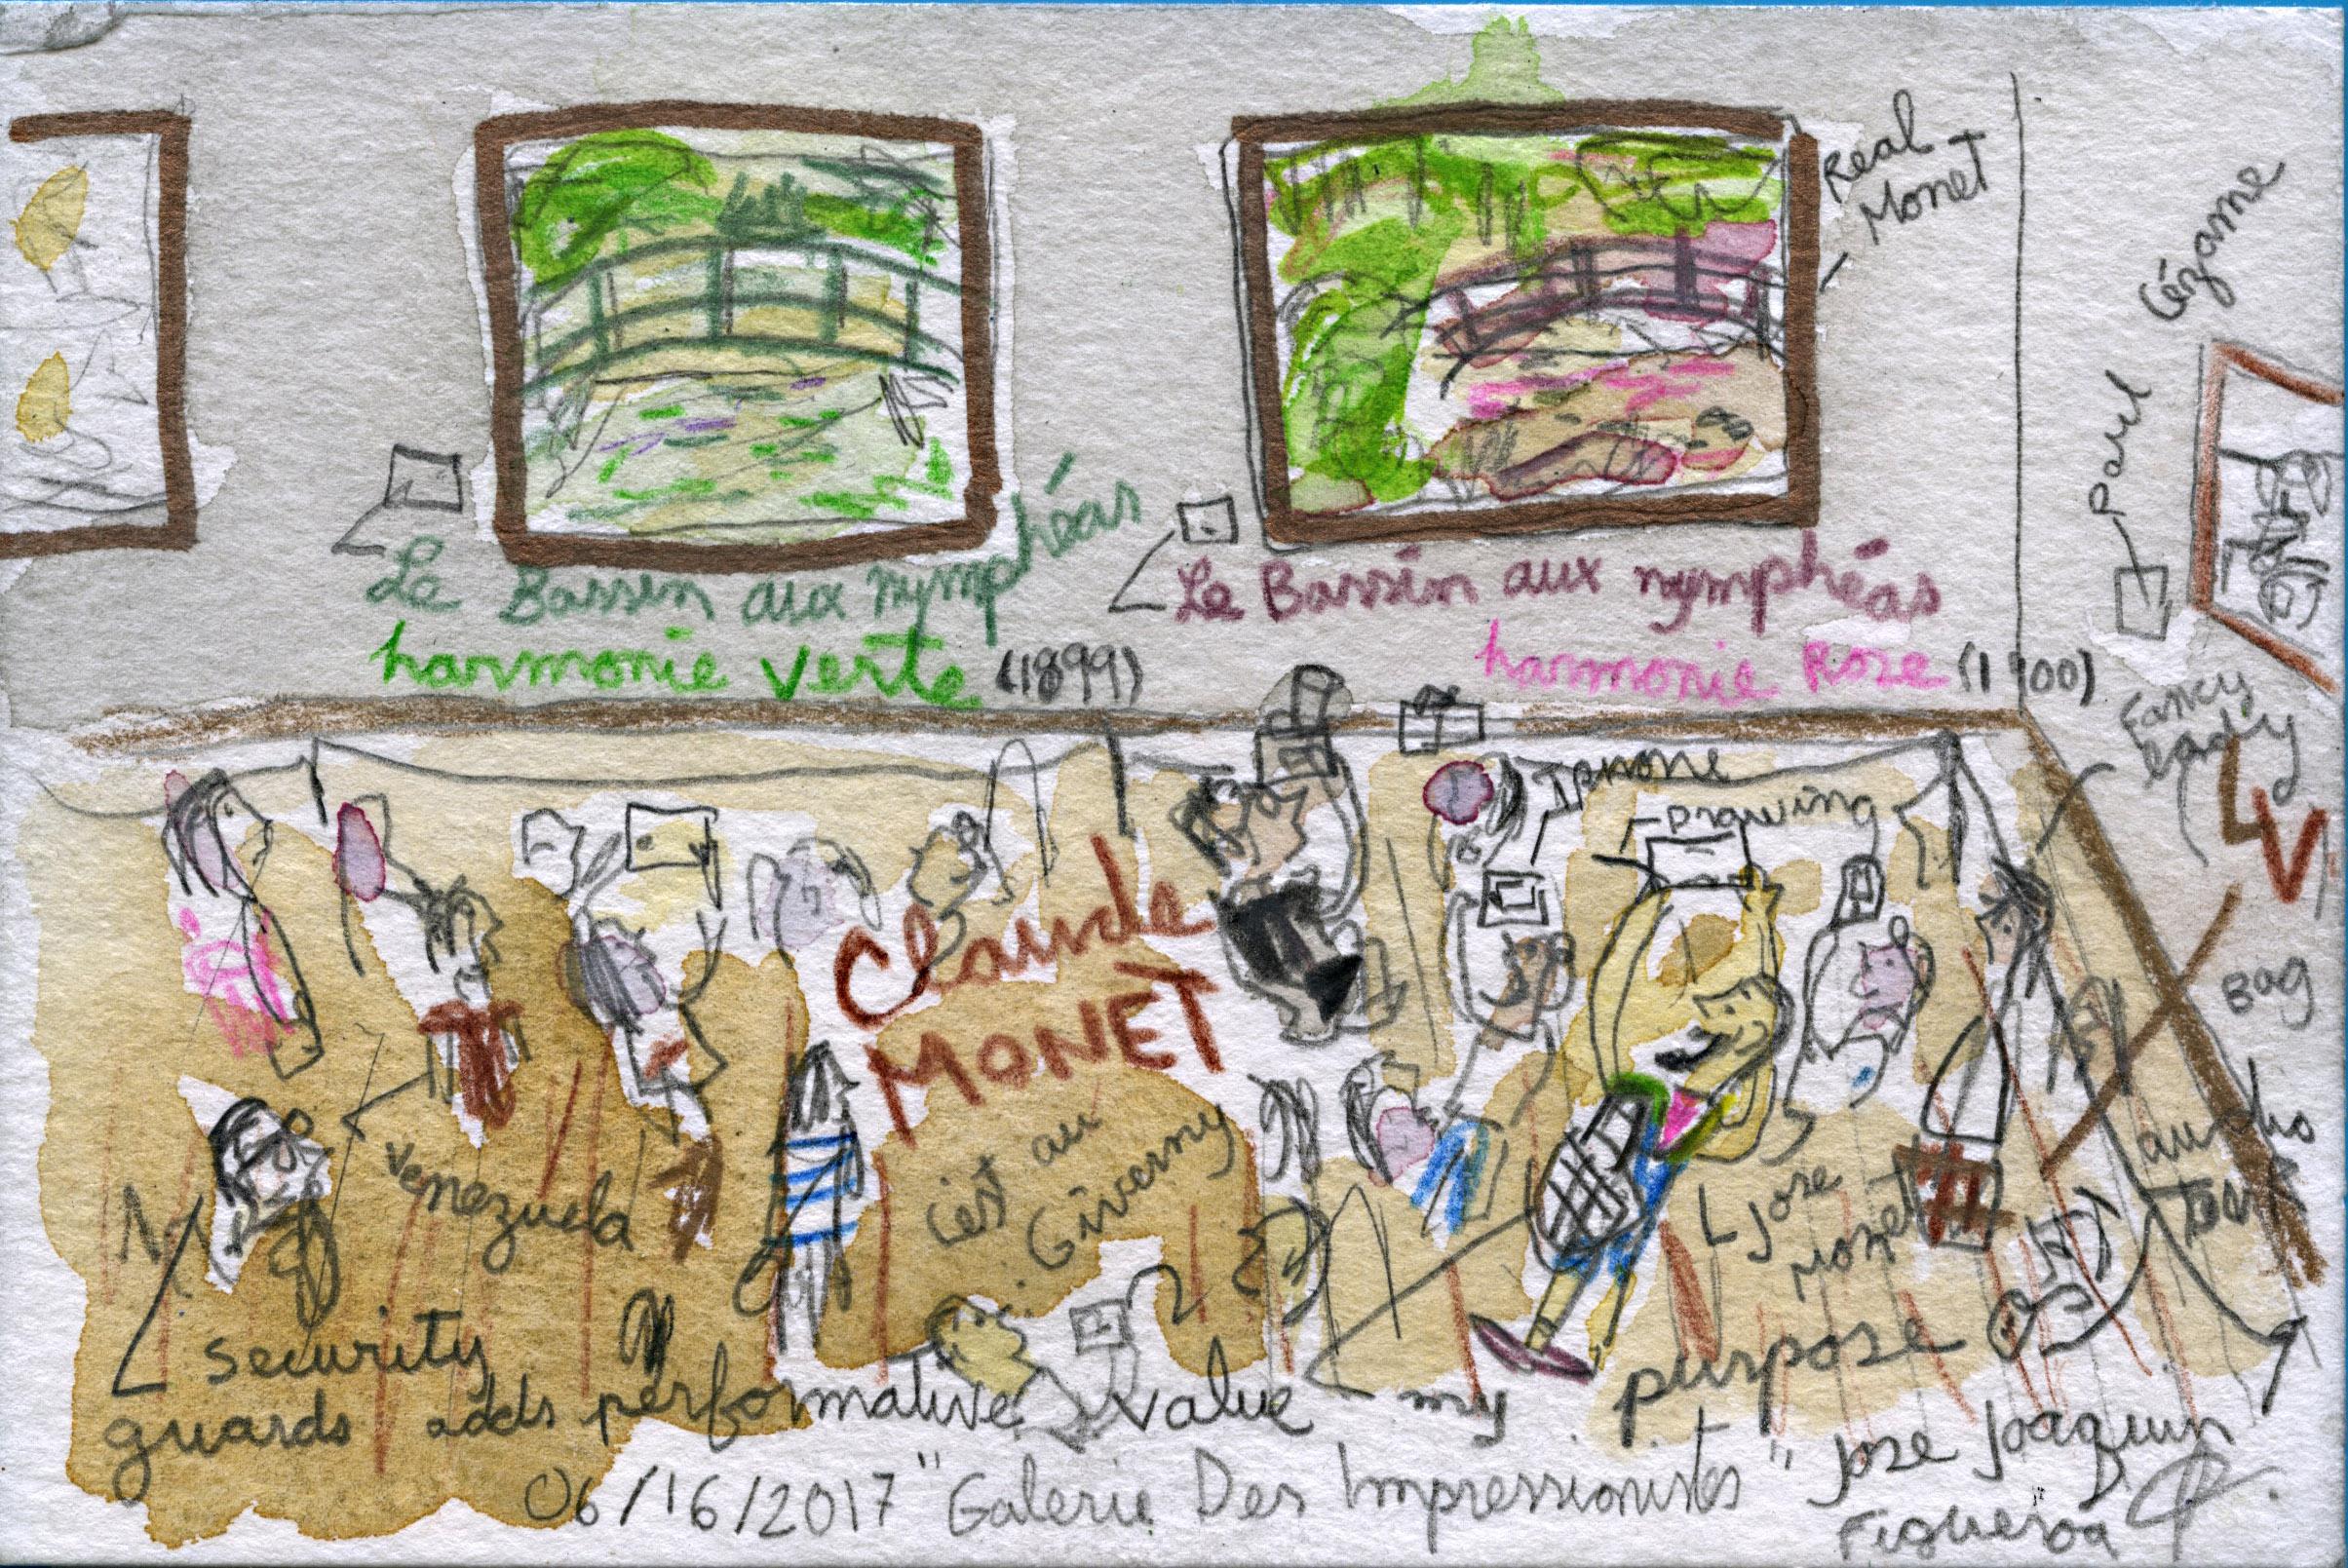 06-16-2017 galerie des impressionists